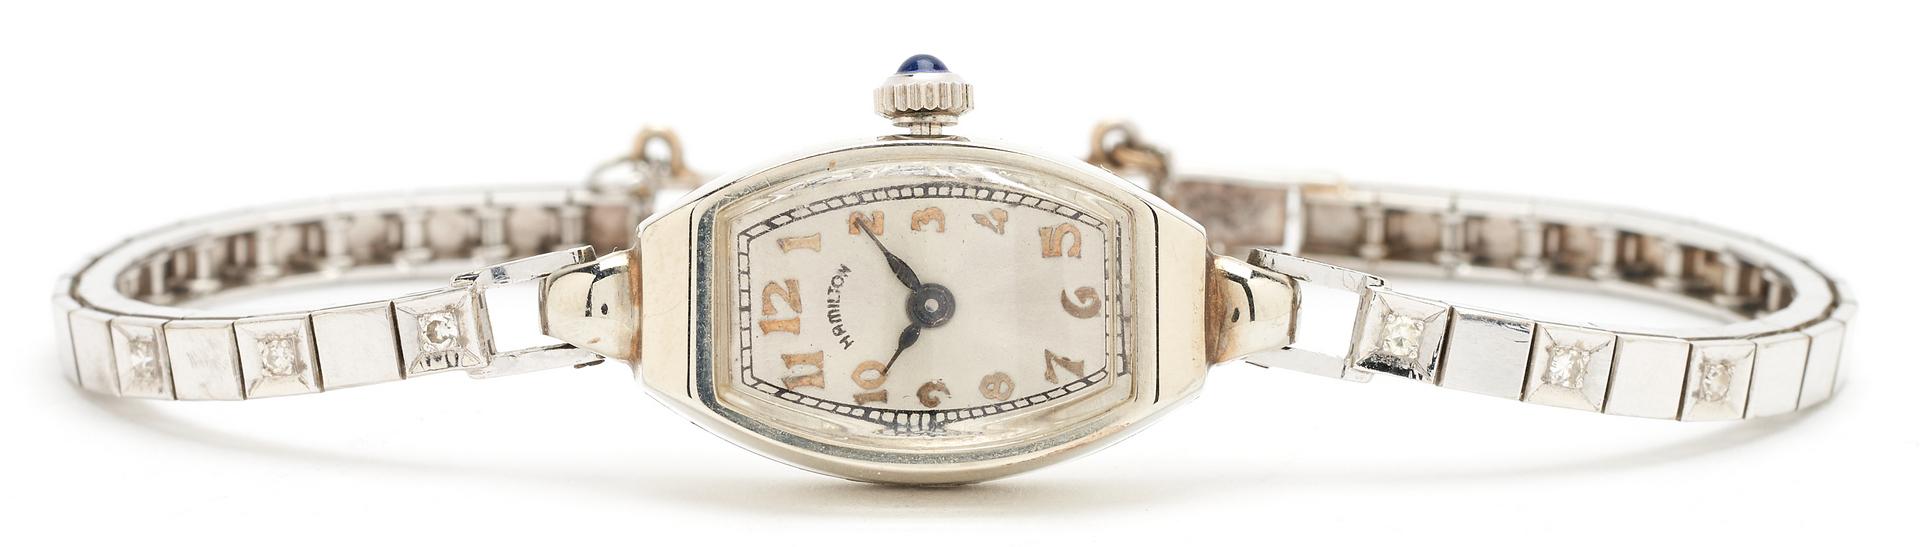 Lot 1208: Ladies 14K Hamilton Watch